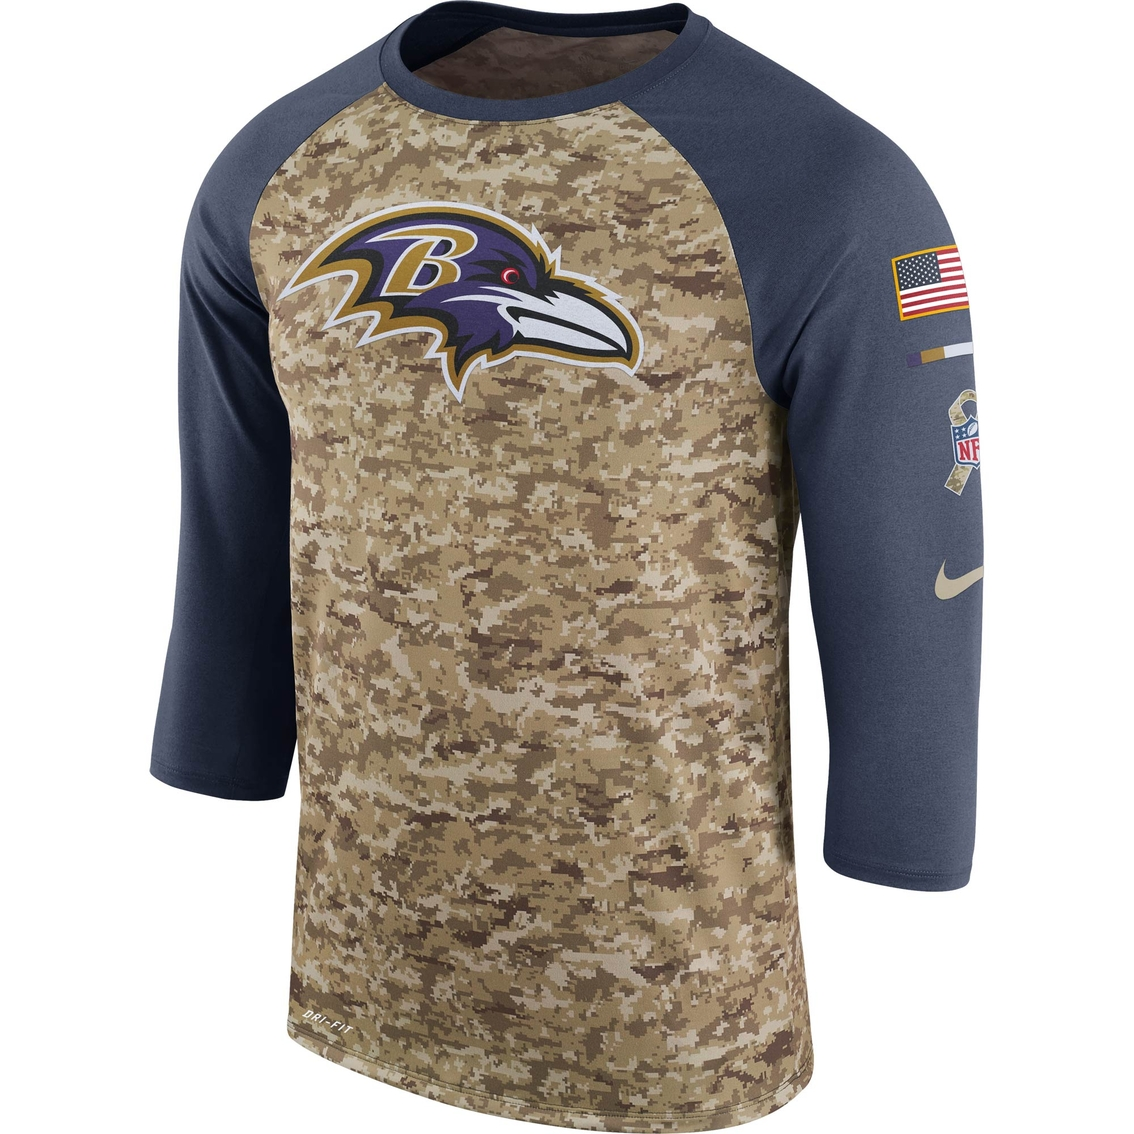 official photos cf1f8 cb003 Nike Nfl Baltimore Ravens Salute To Service Raglan Tee ...